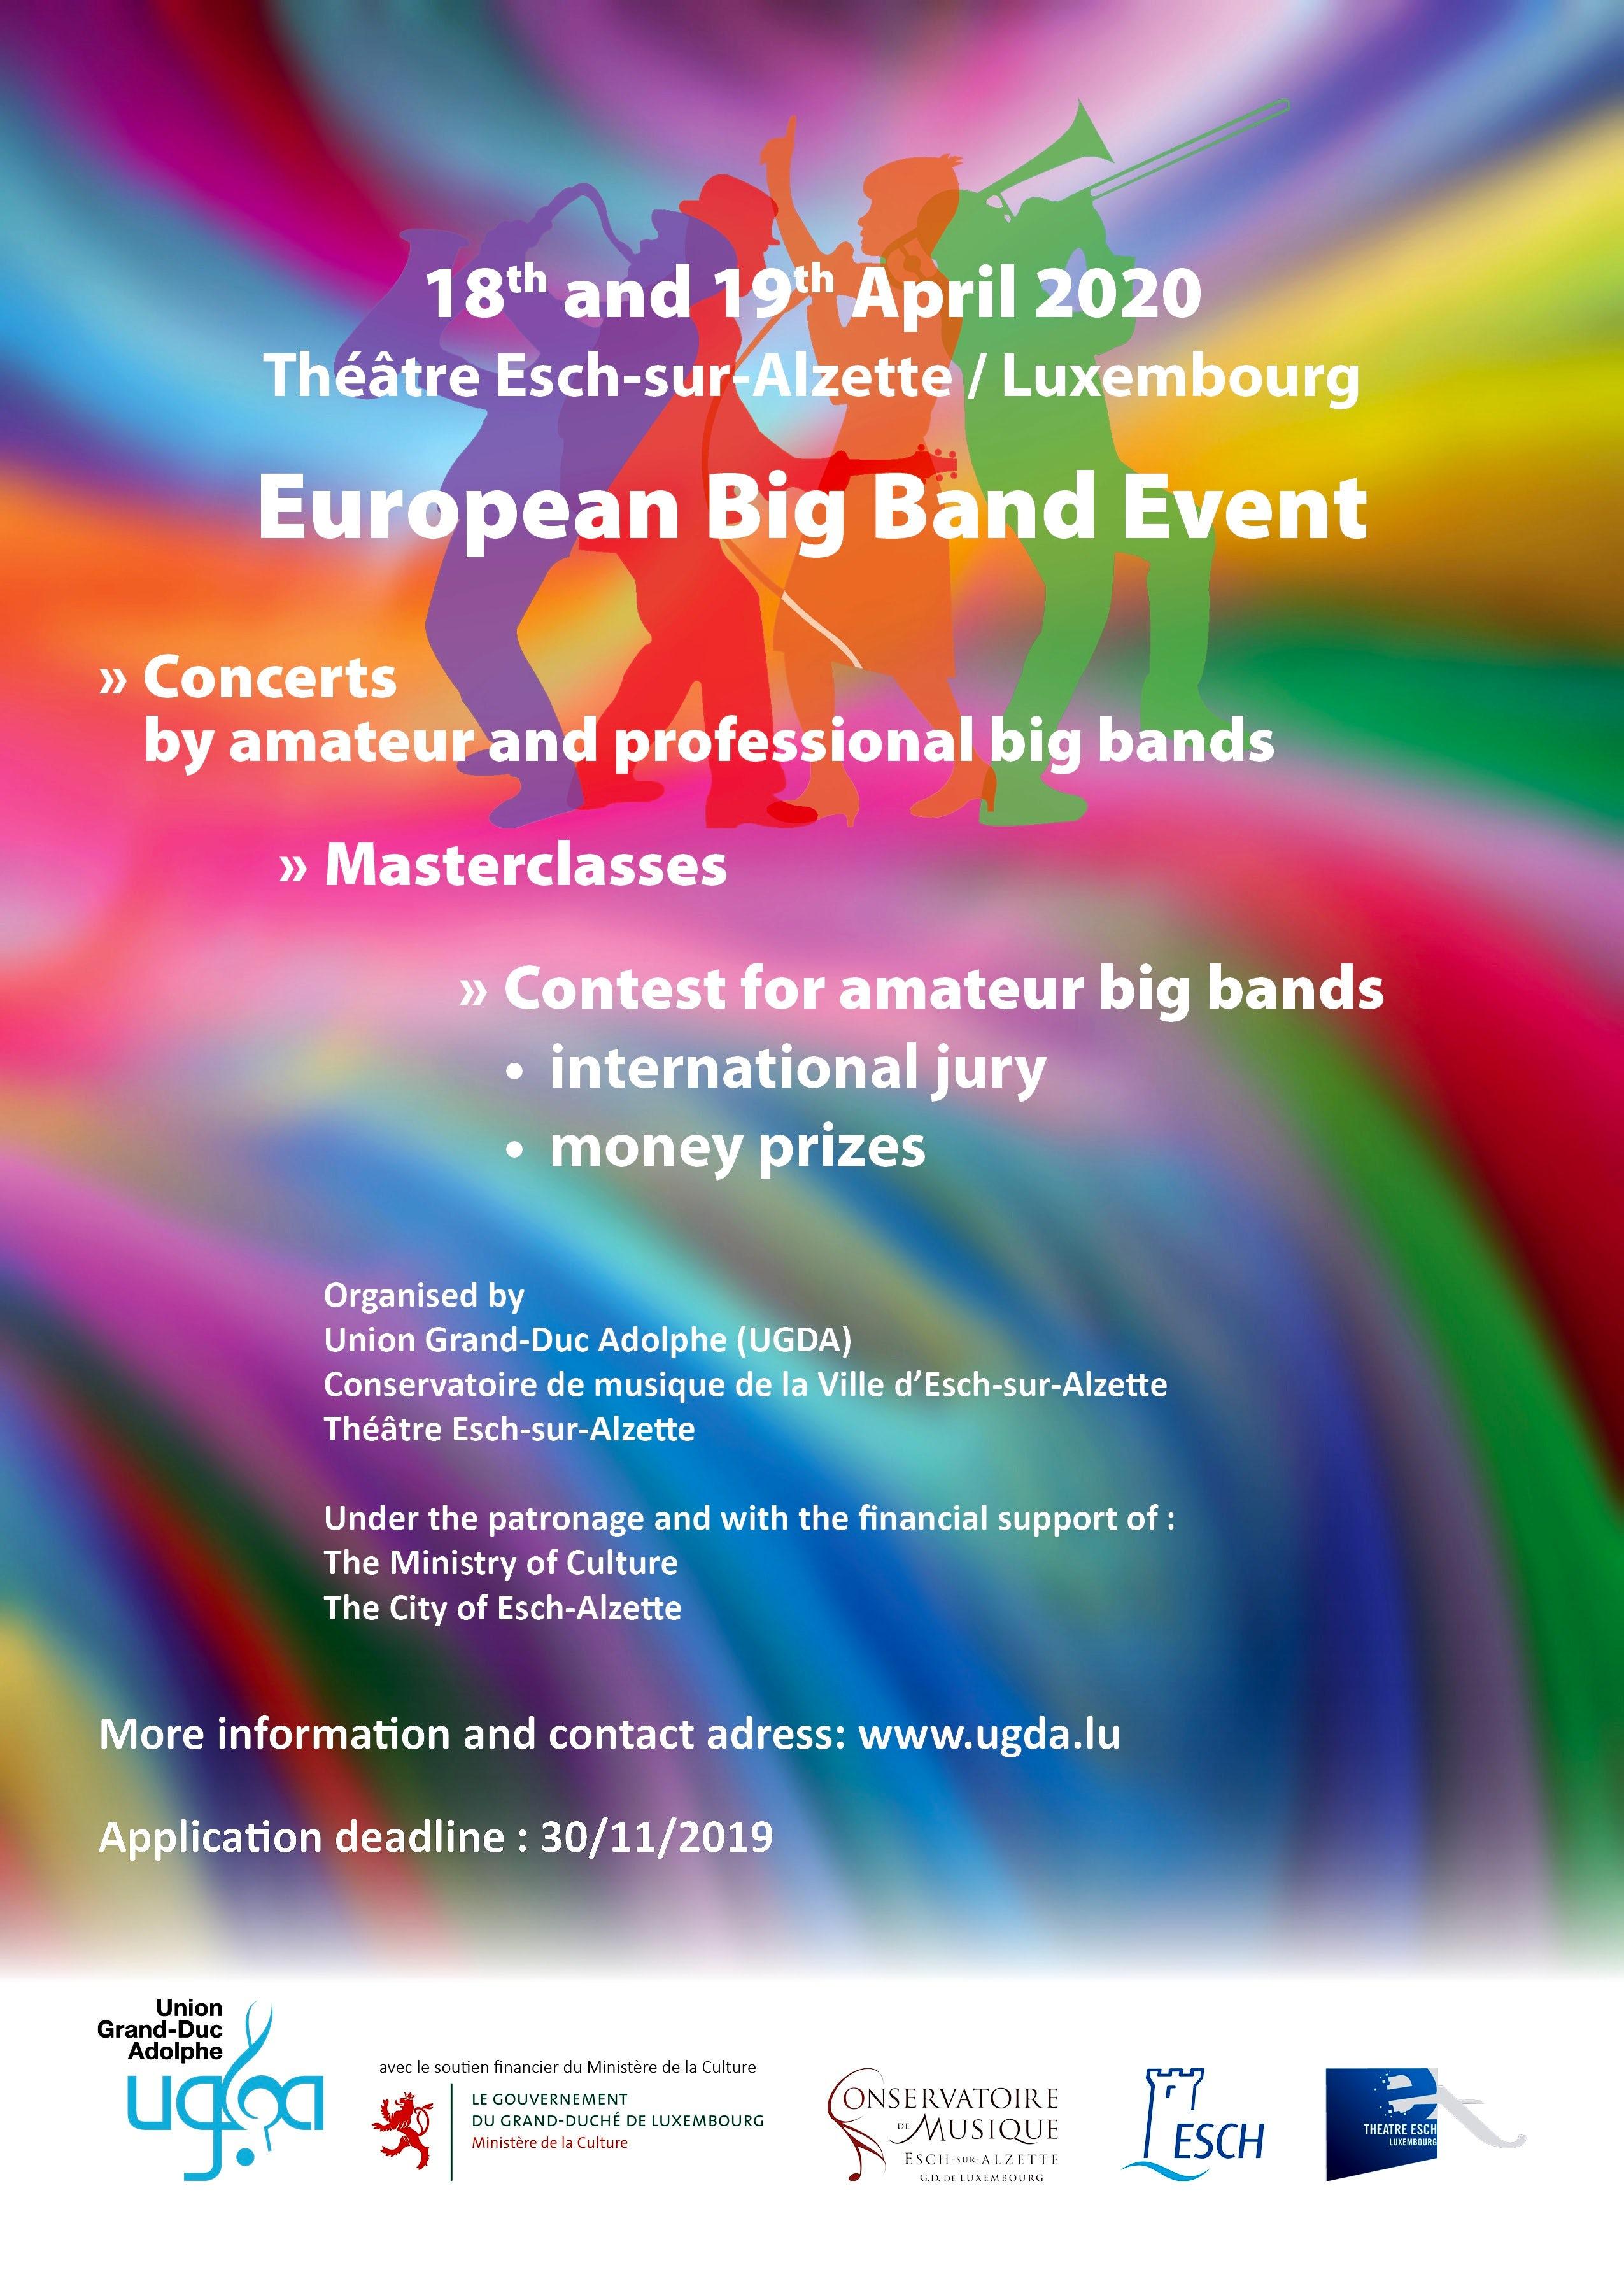 2020 Aff 05 19 European Big Band Event